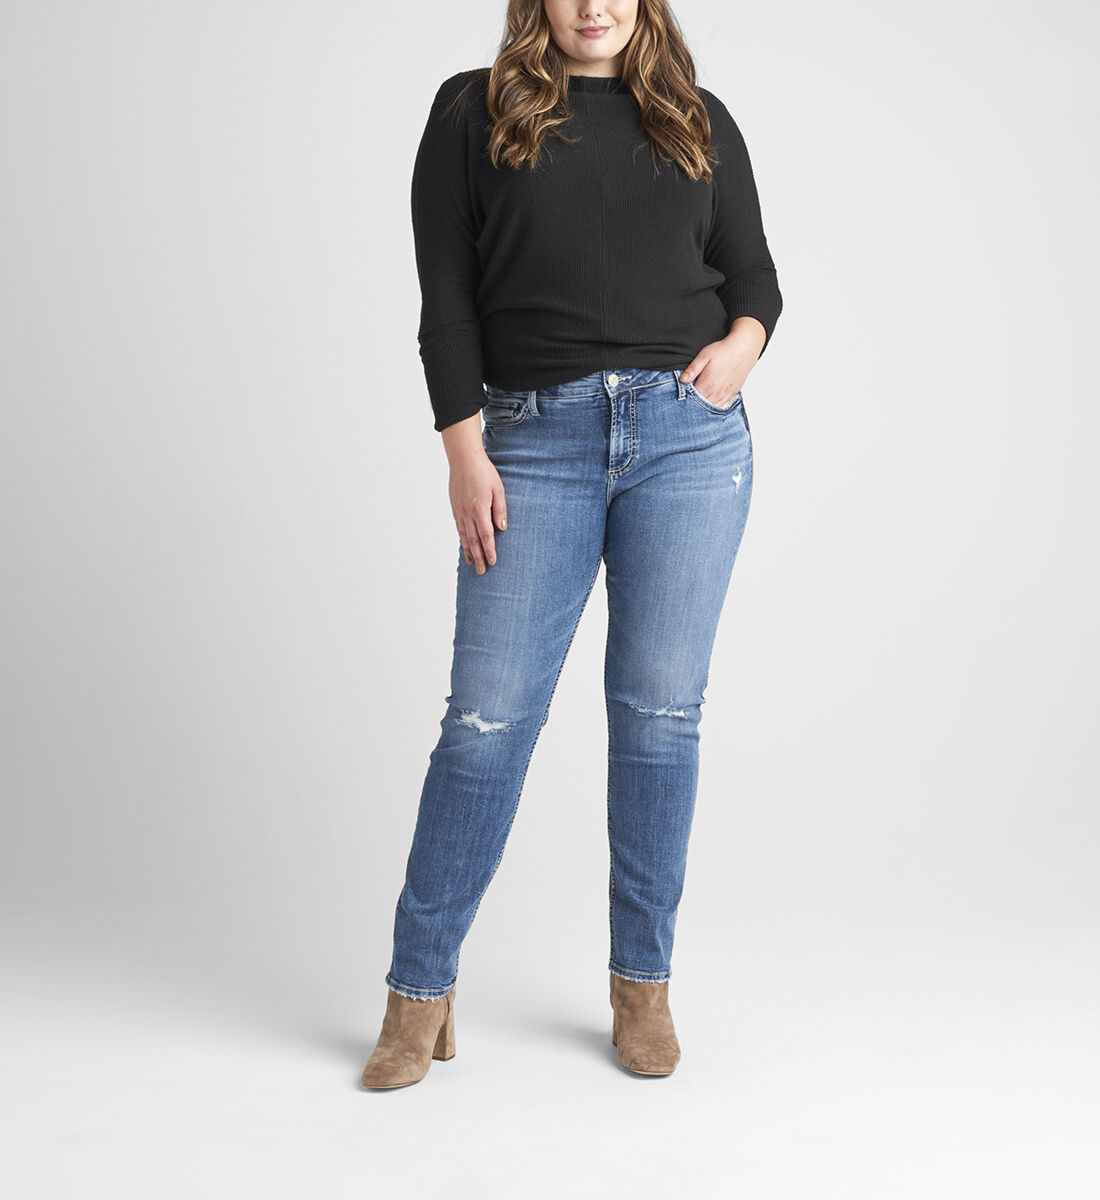 Elyse Mid Rise Straight Leg Jeans Plus Size Front